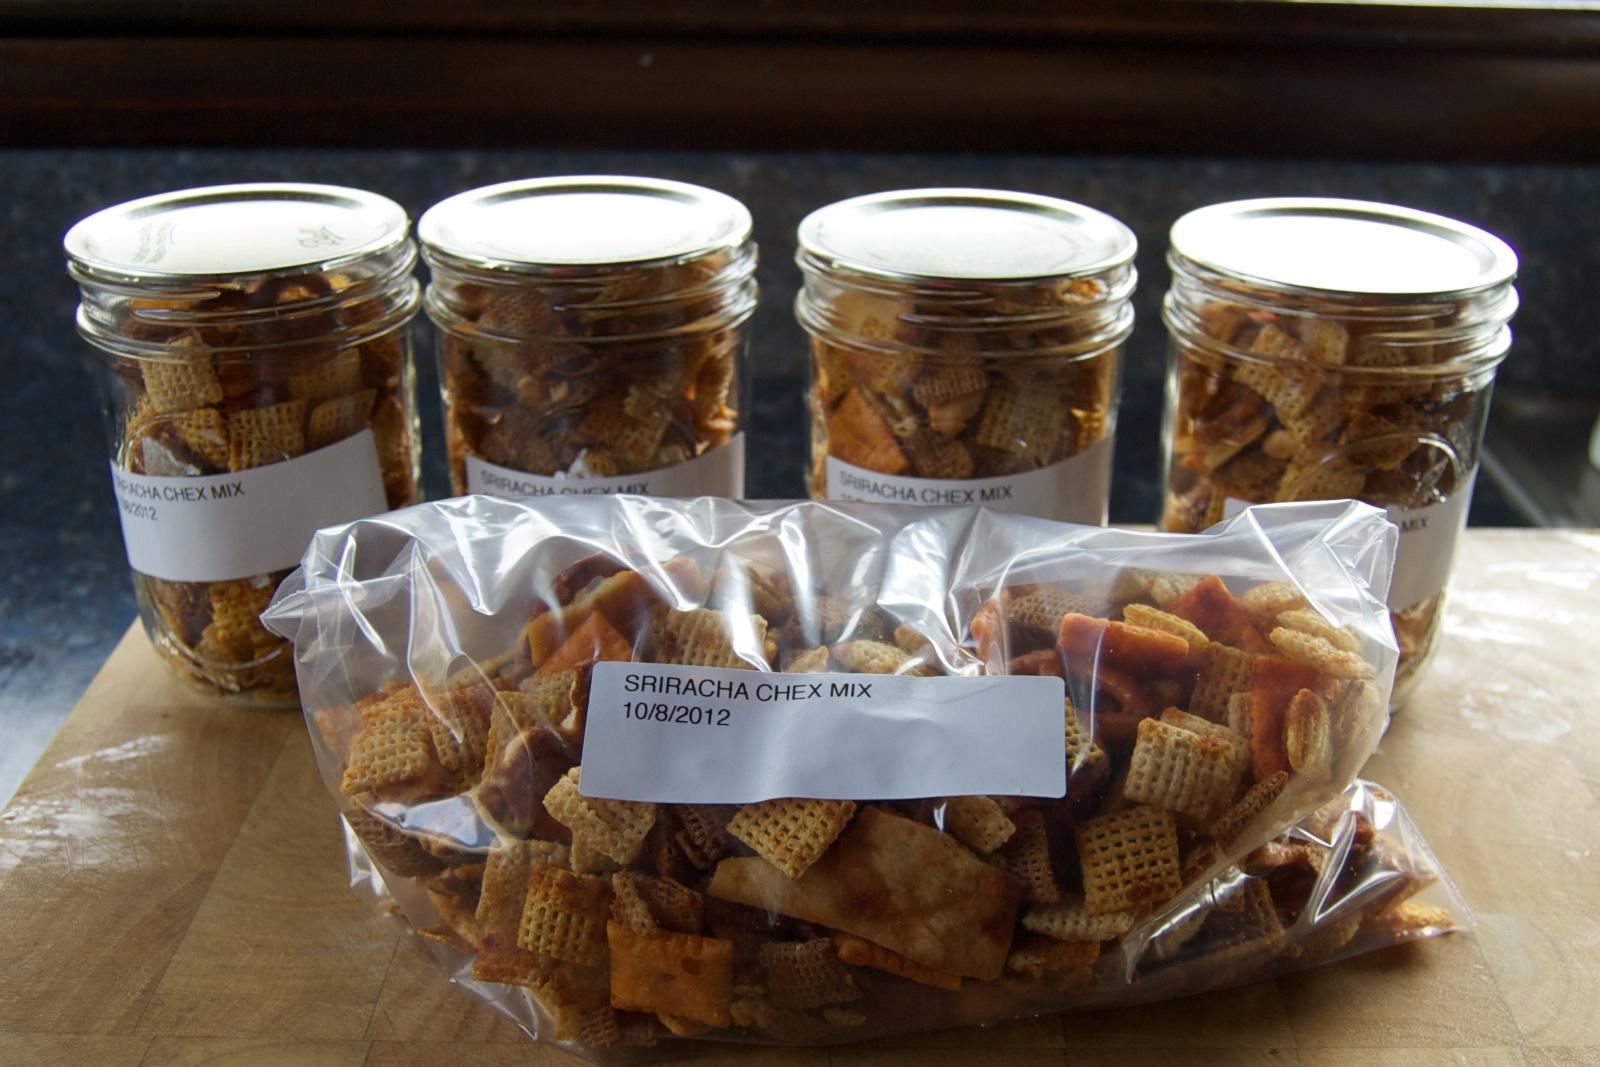 http://blog.rickk.com/food/2012/10/08/ate.2012.10.08.c1.jpg